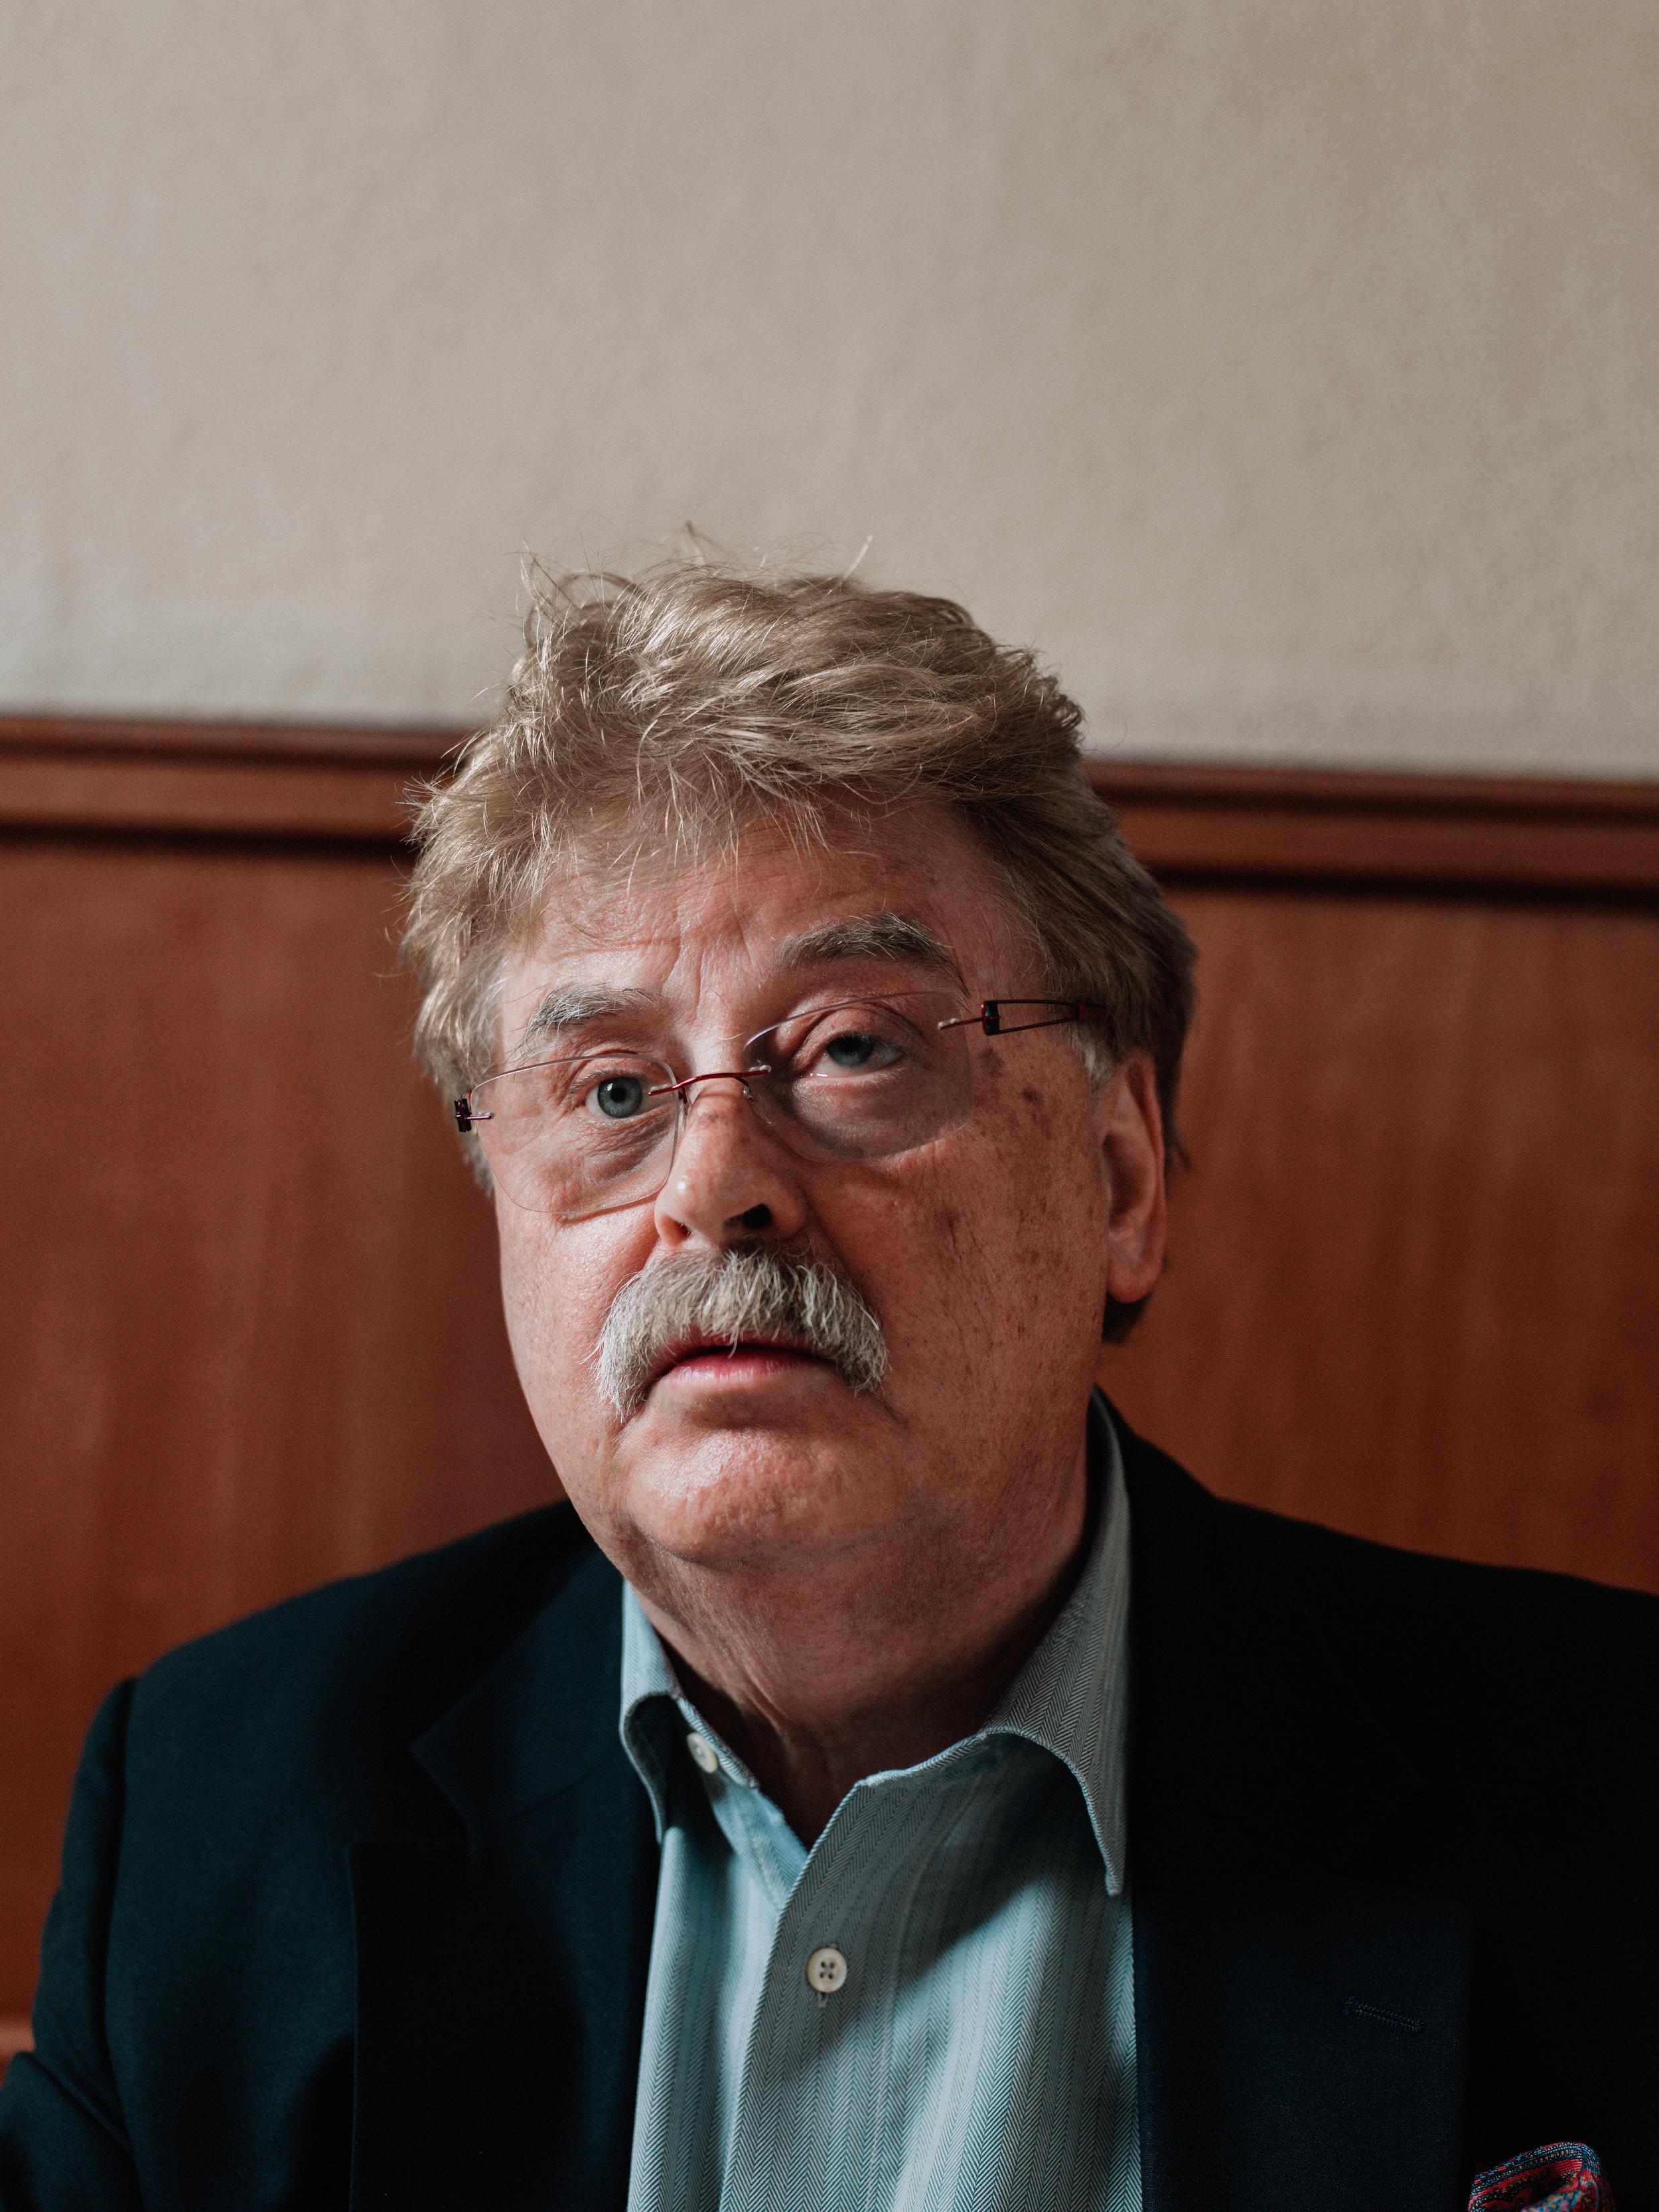 Elmar Brok Fotograf: Patrick Pollmeier